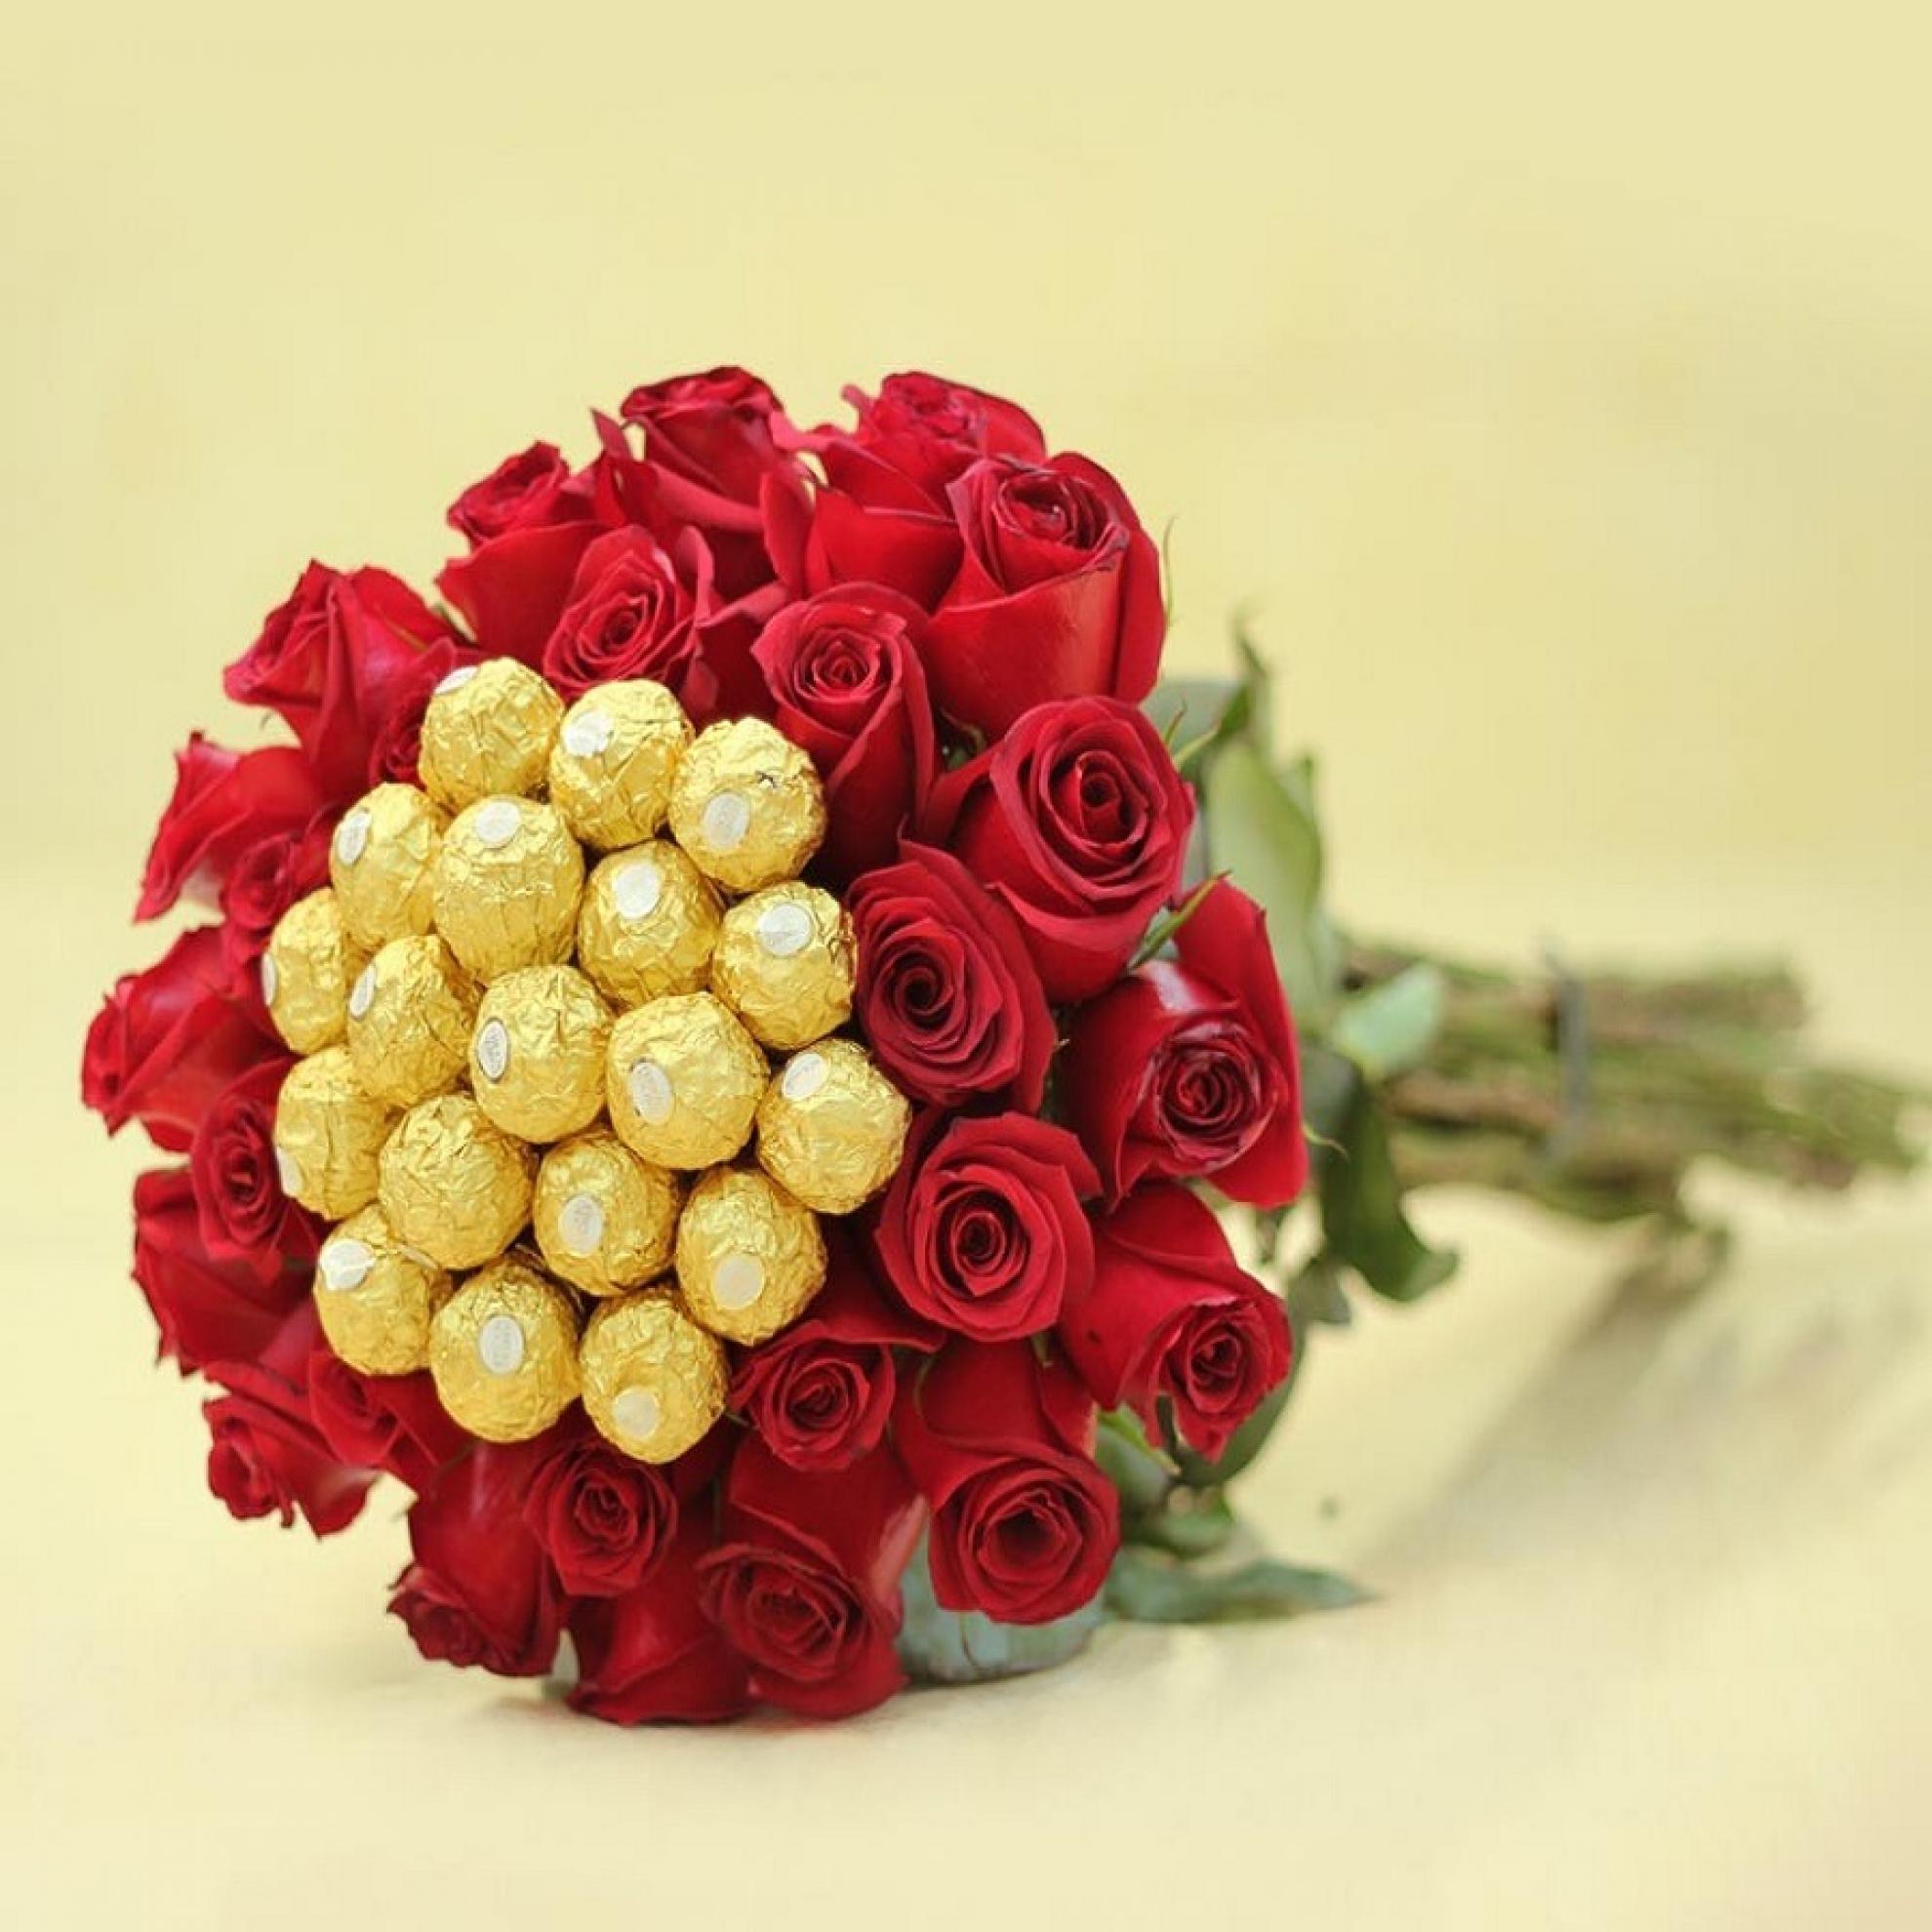 Buqu� de Vinte  Rosas com Ferrero Rocher -  BT13